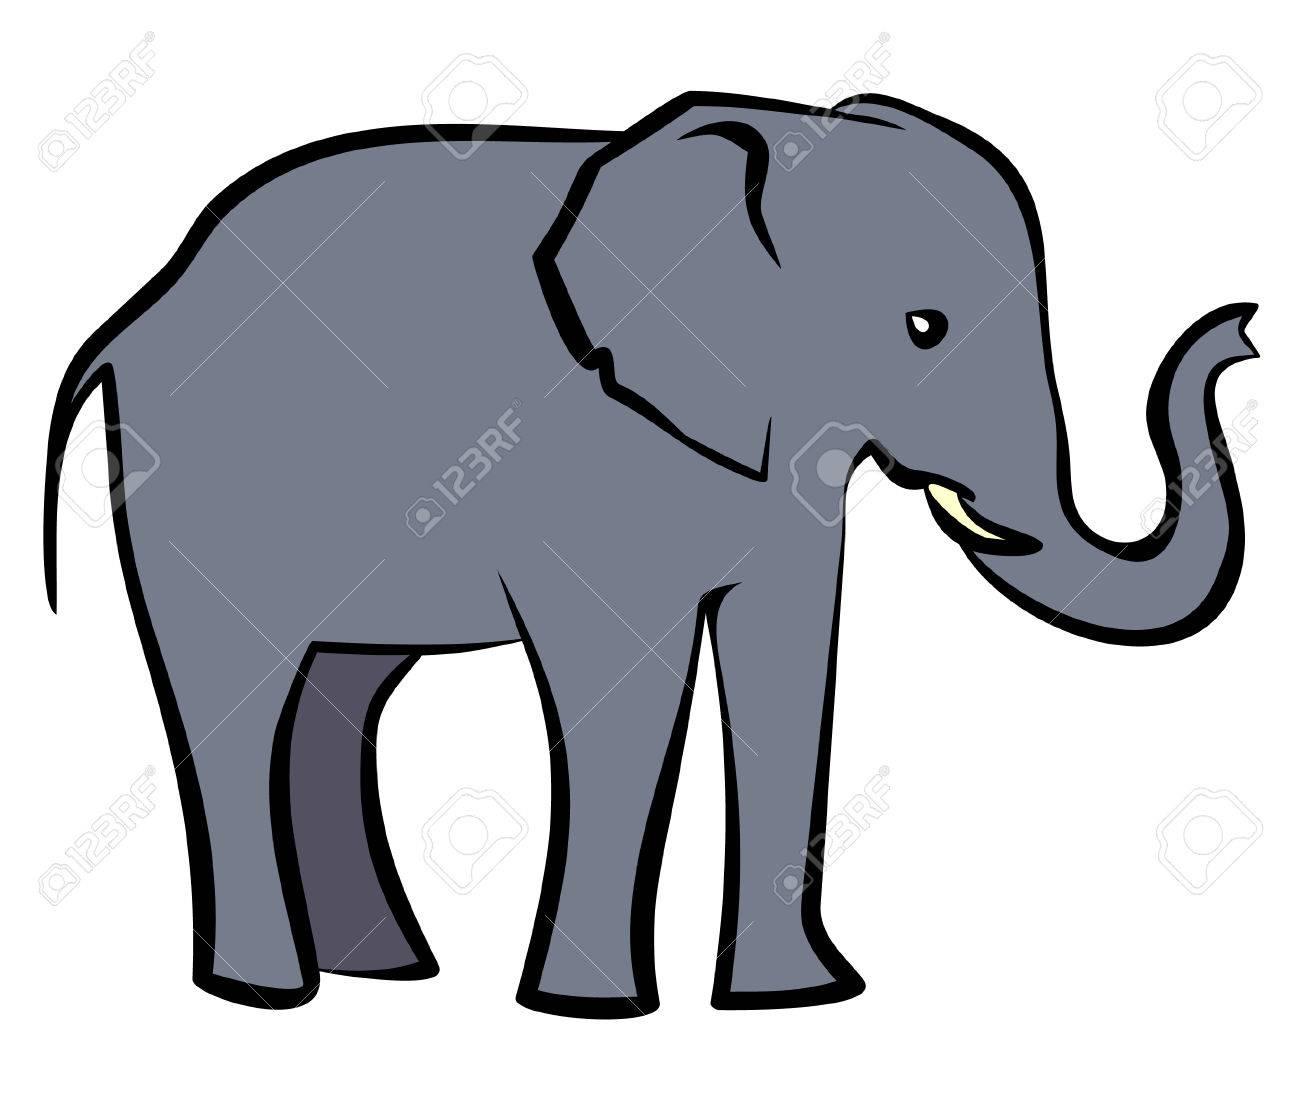 1300x1110 Baby Elephant. Vector Illustration Royalty Free Cliparts, Vectors